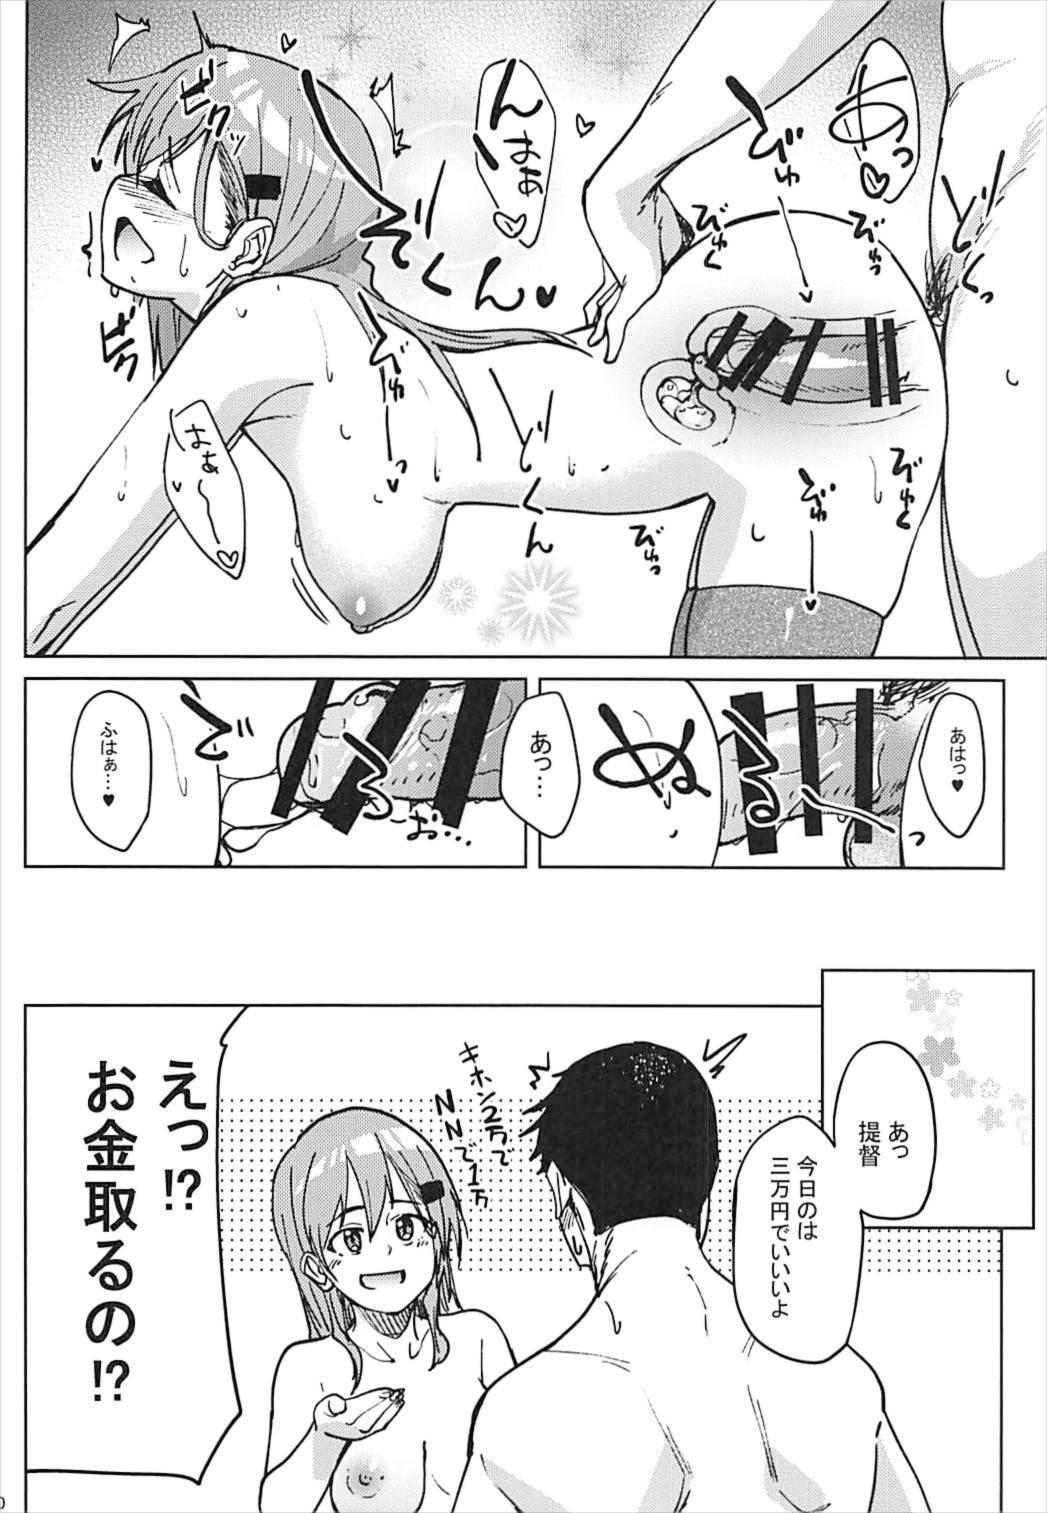 Suzuya to Ecchi Suru? 18